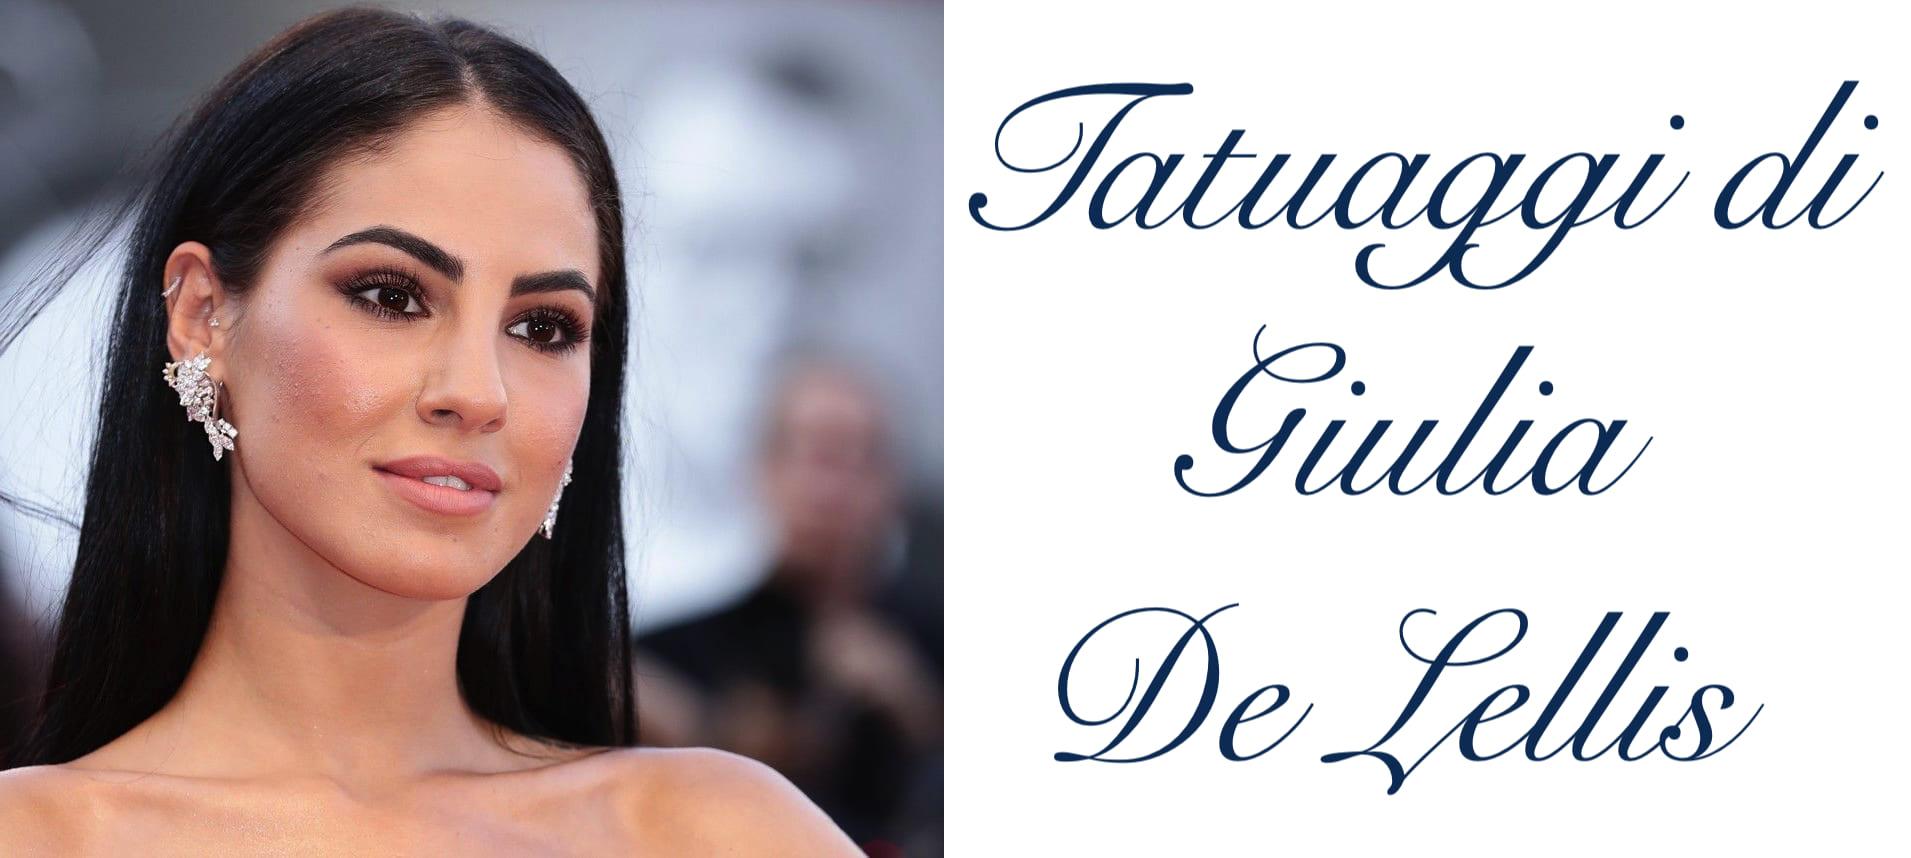 Tatuaggio Tattoo Giulia De Lellis Significato